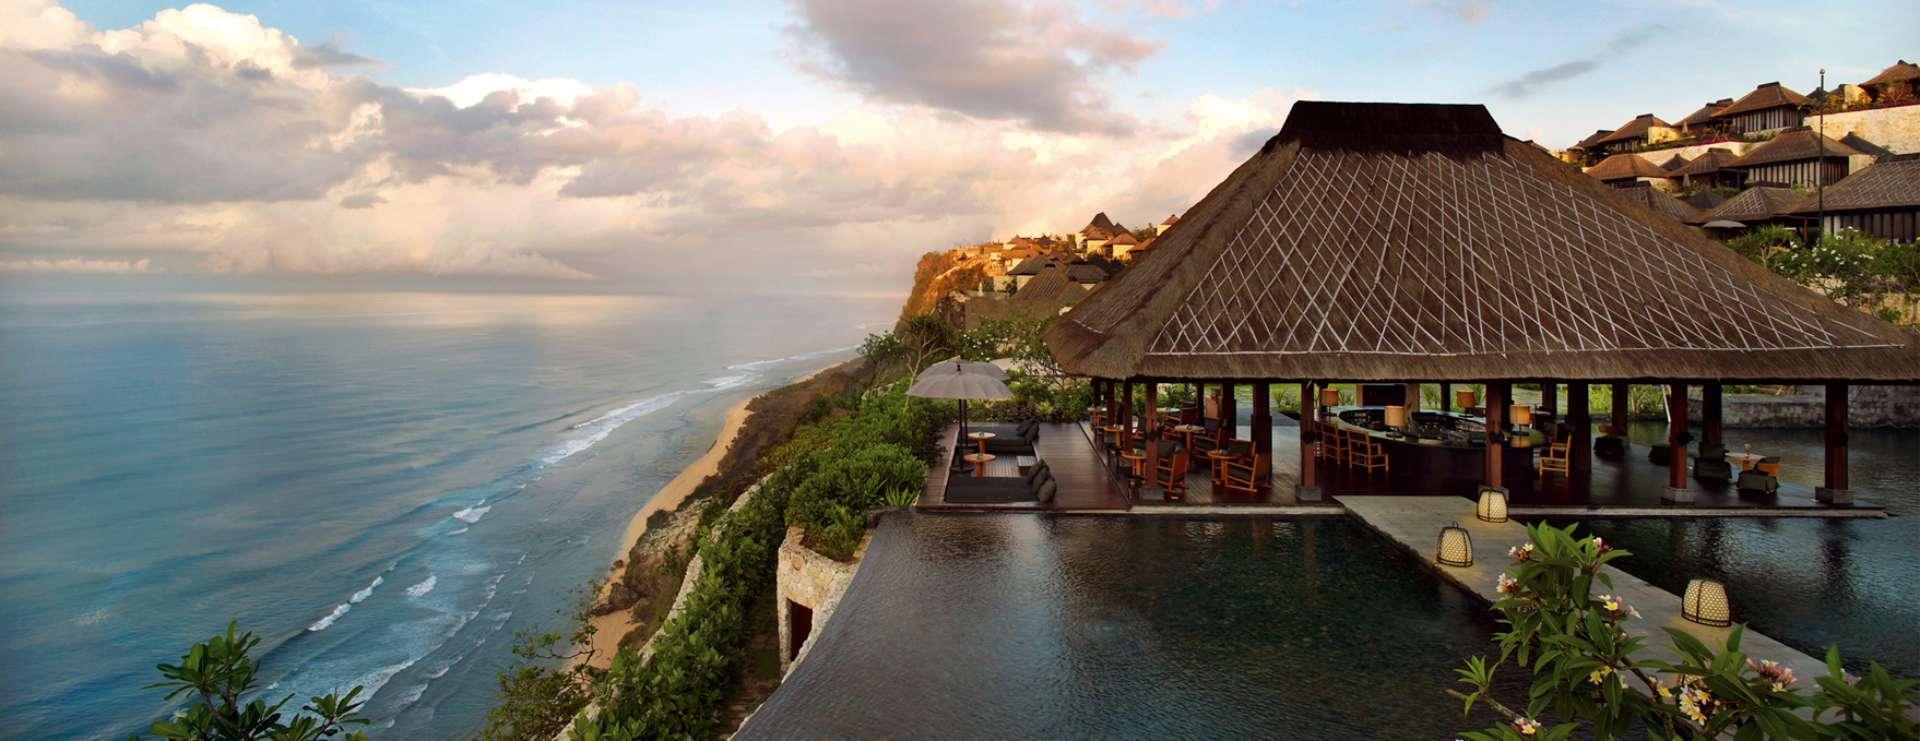 Uncategorized Honeymoon Hotels In Bali bali resorts arabia weddings bulgari